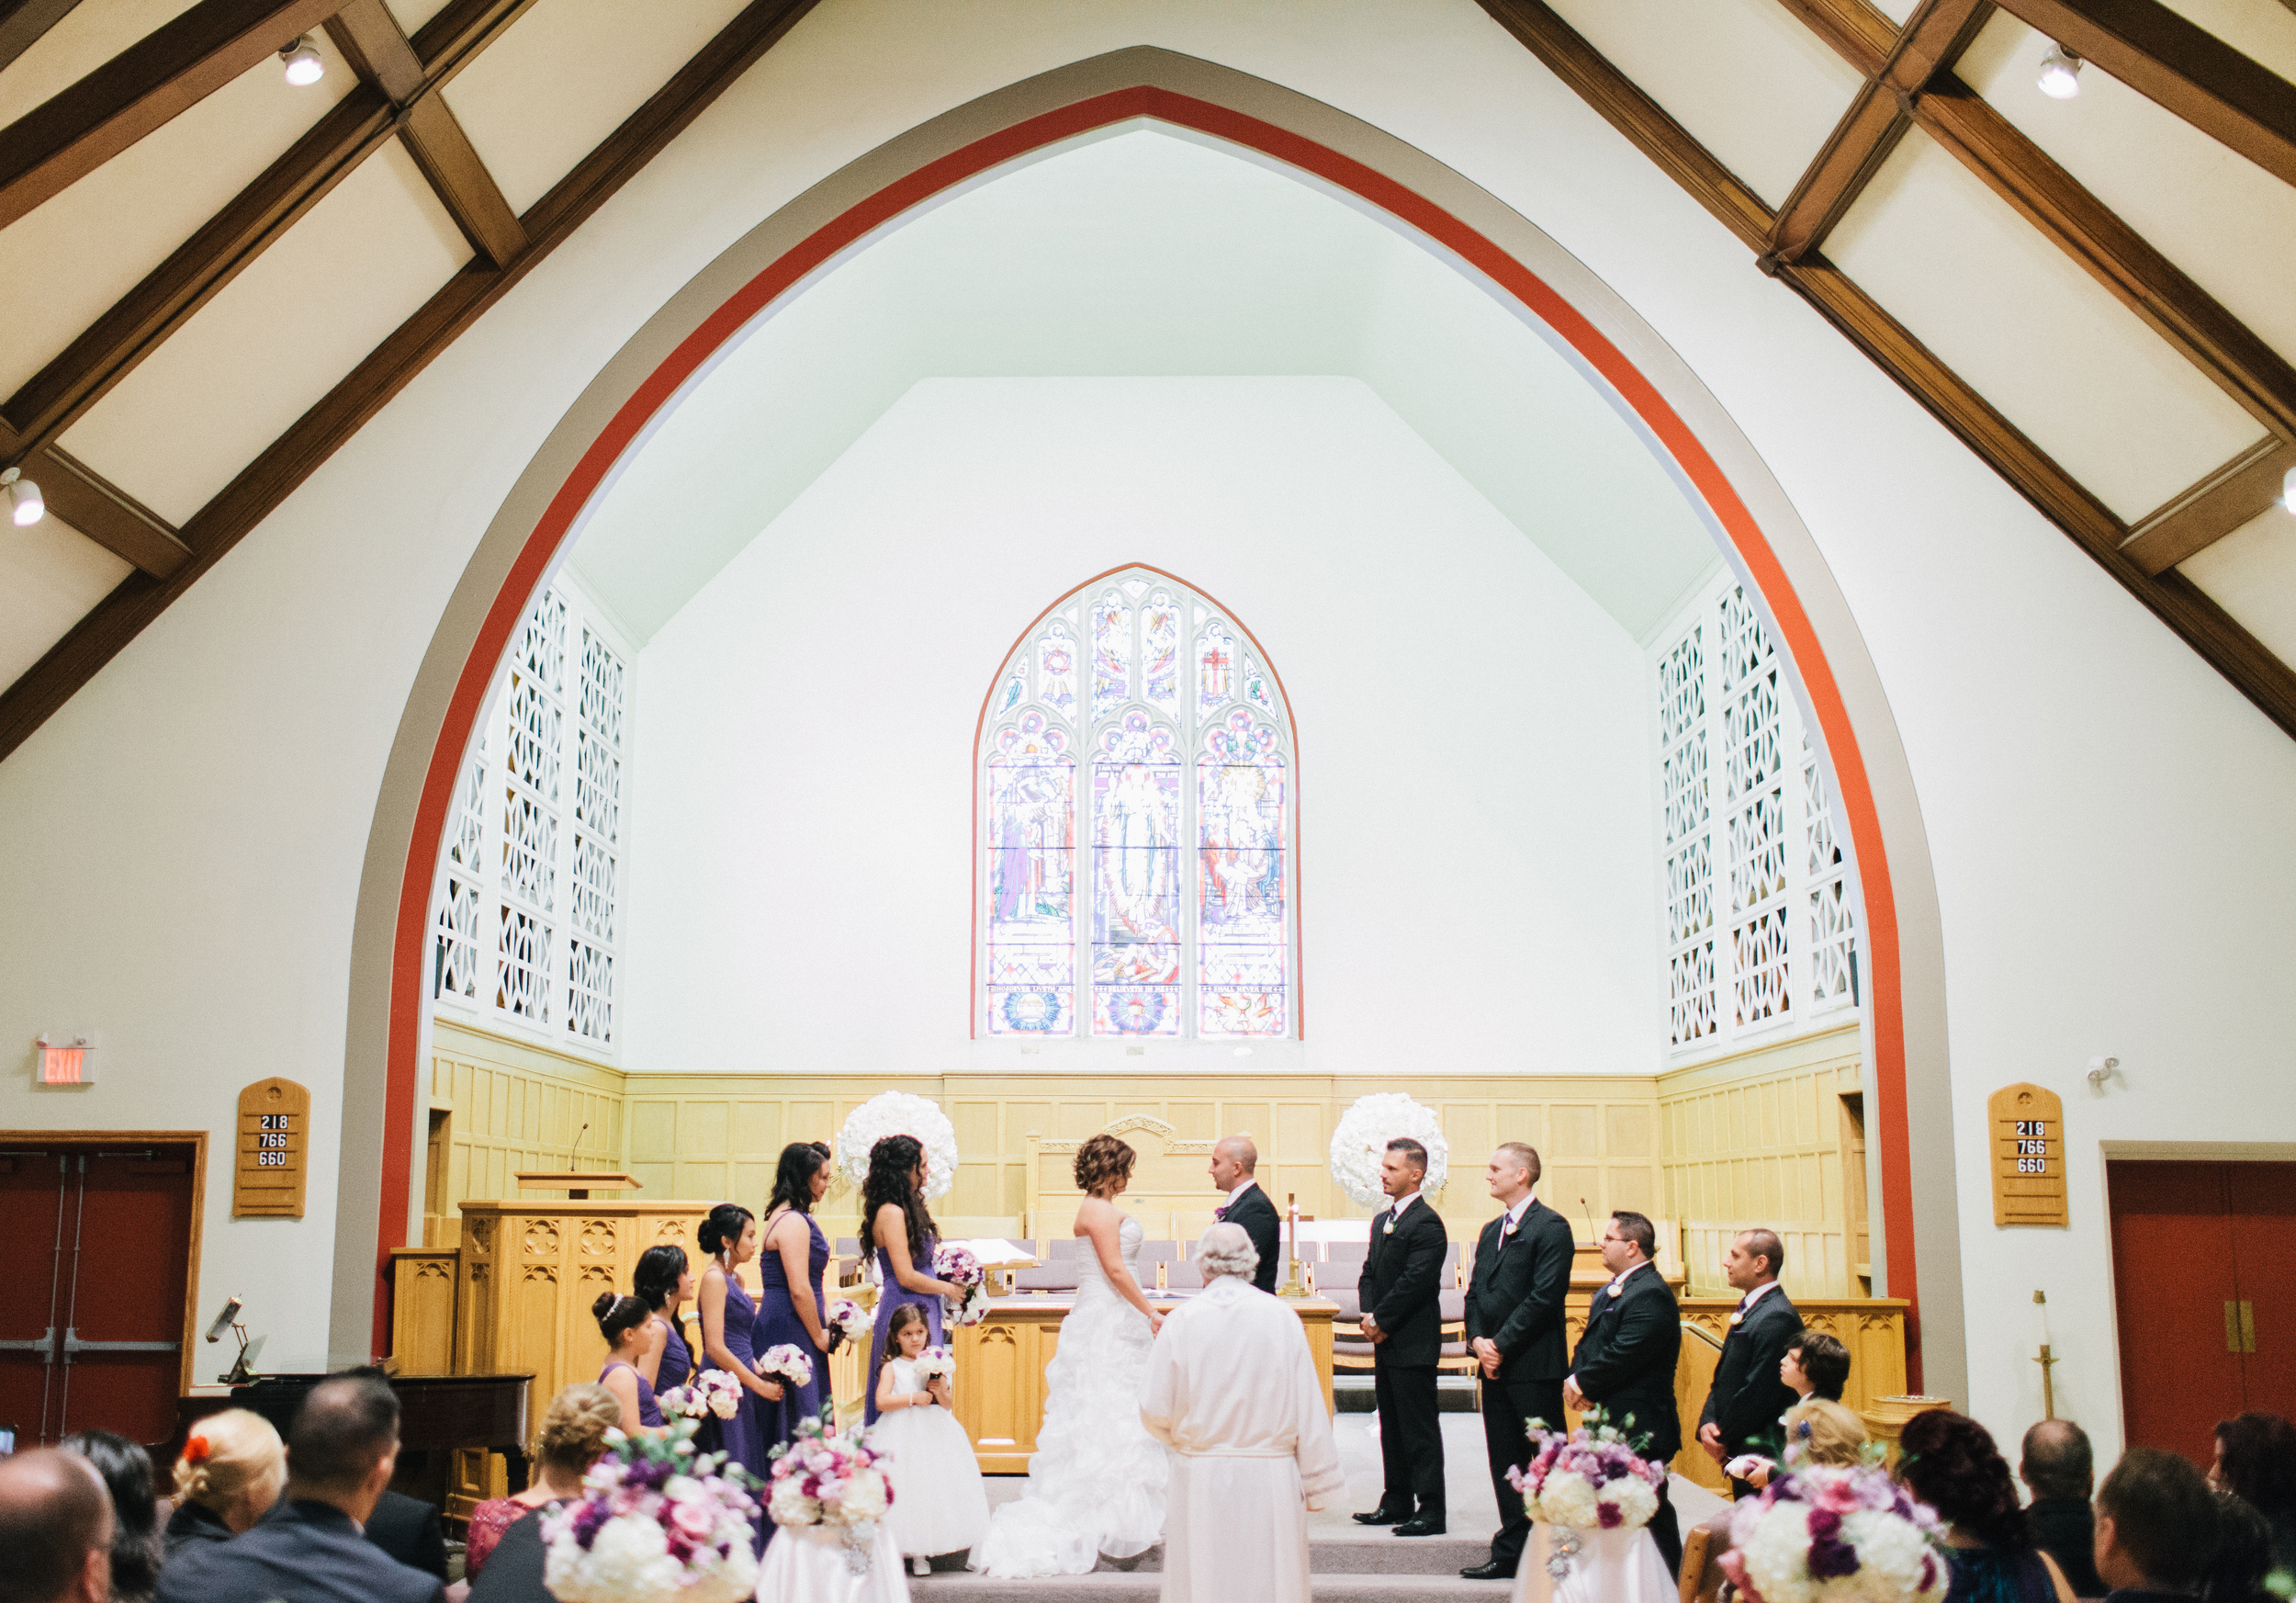 Stephanie-Kyle-paradise-banquet-hall-michael-rousseau-photography-best-toronto-wedding-photographer-documentary-wedding022.JPG